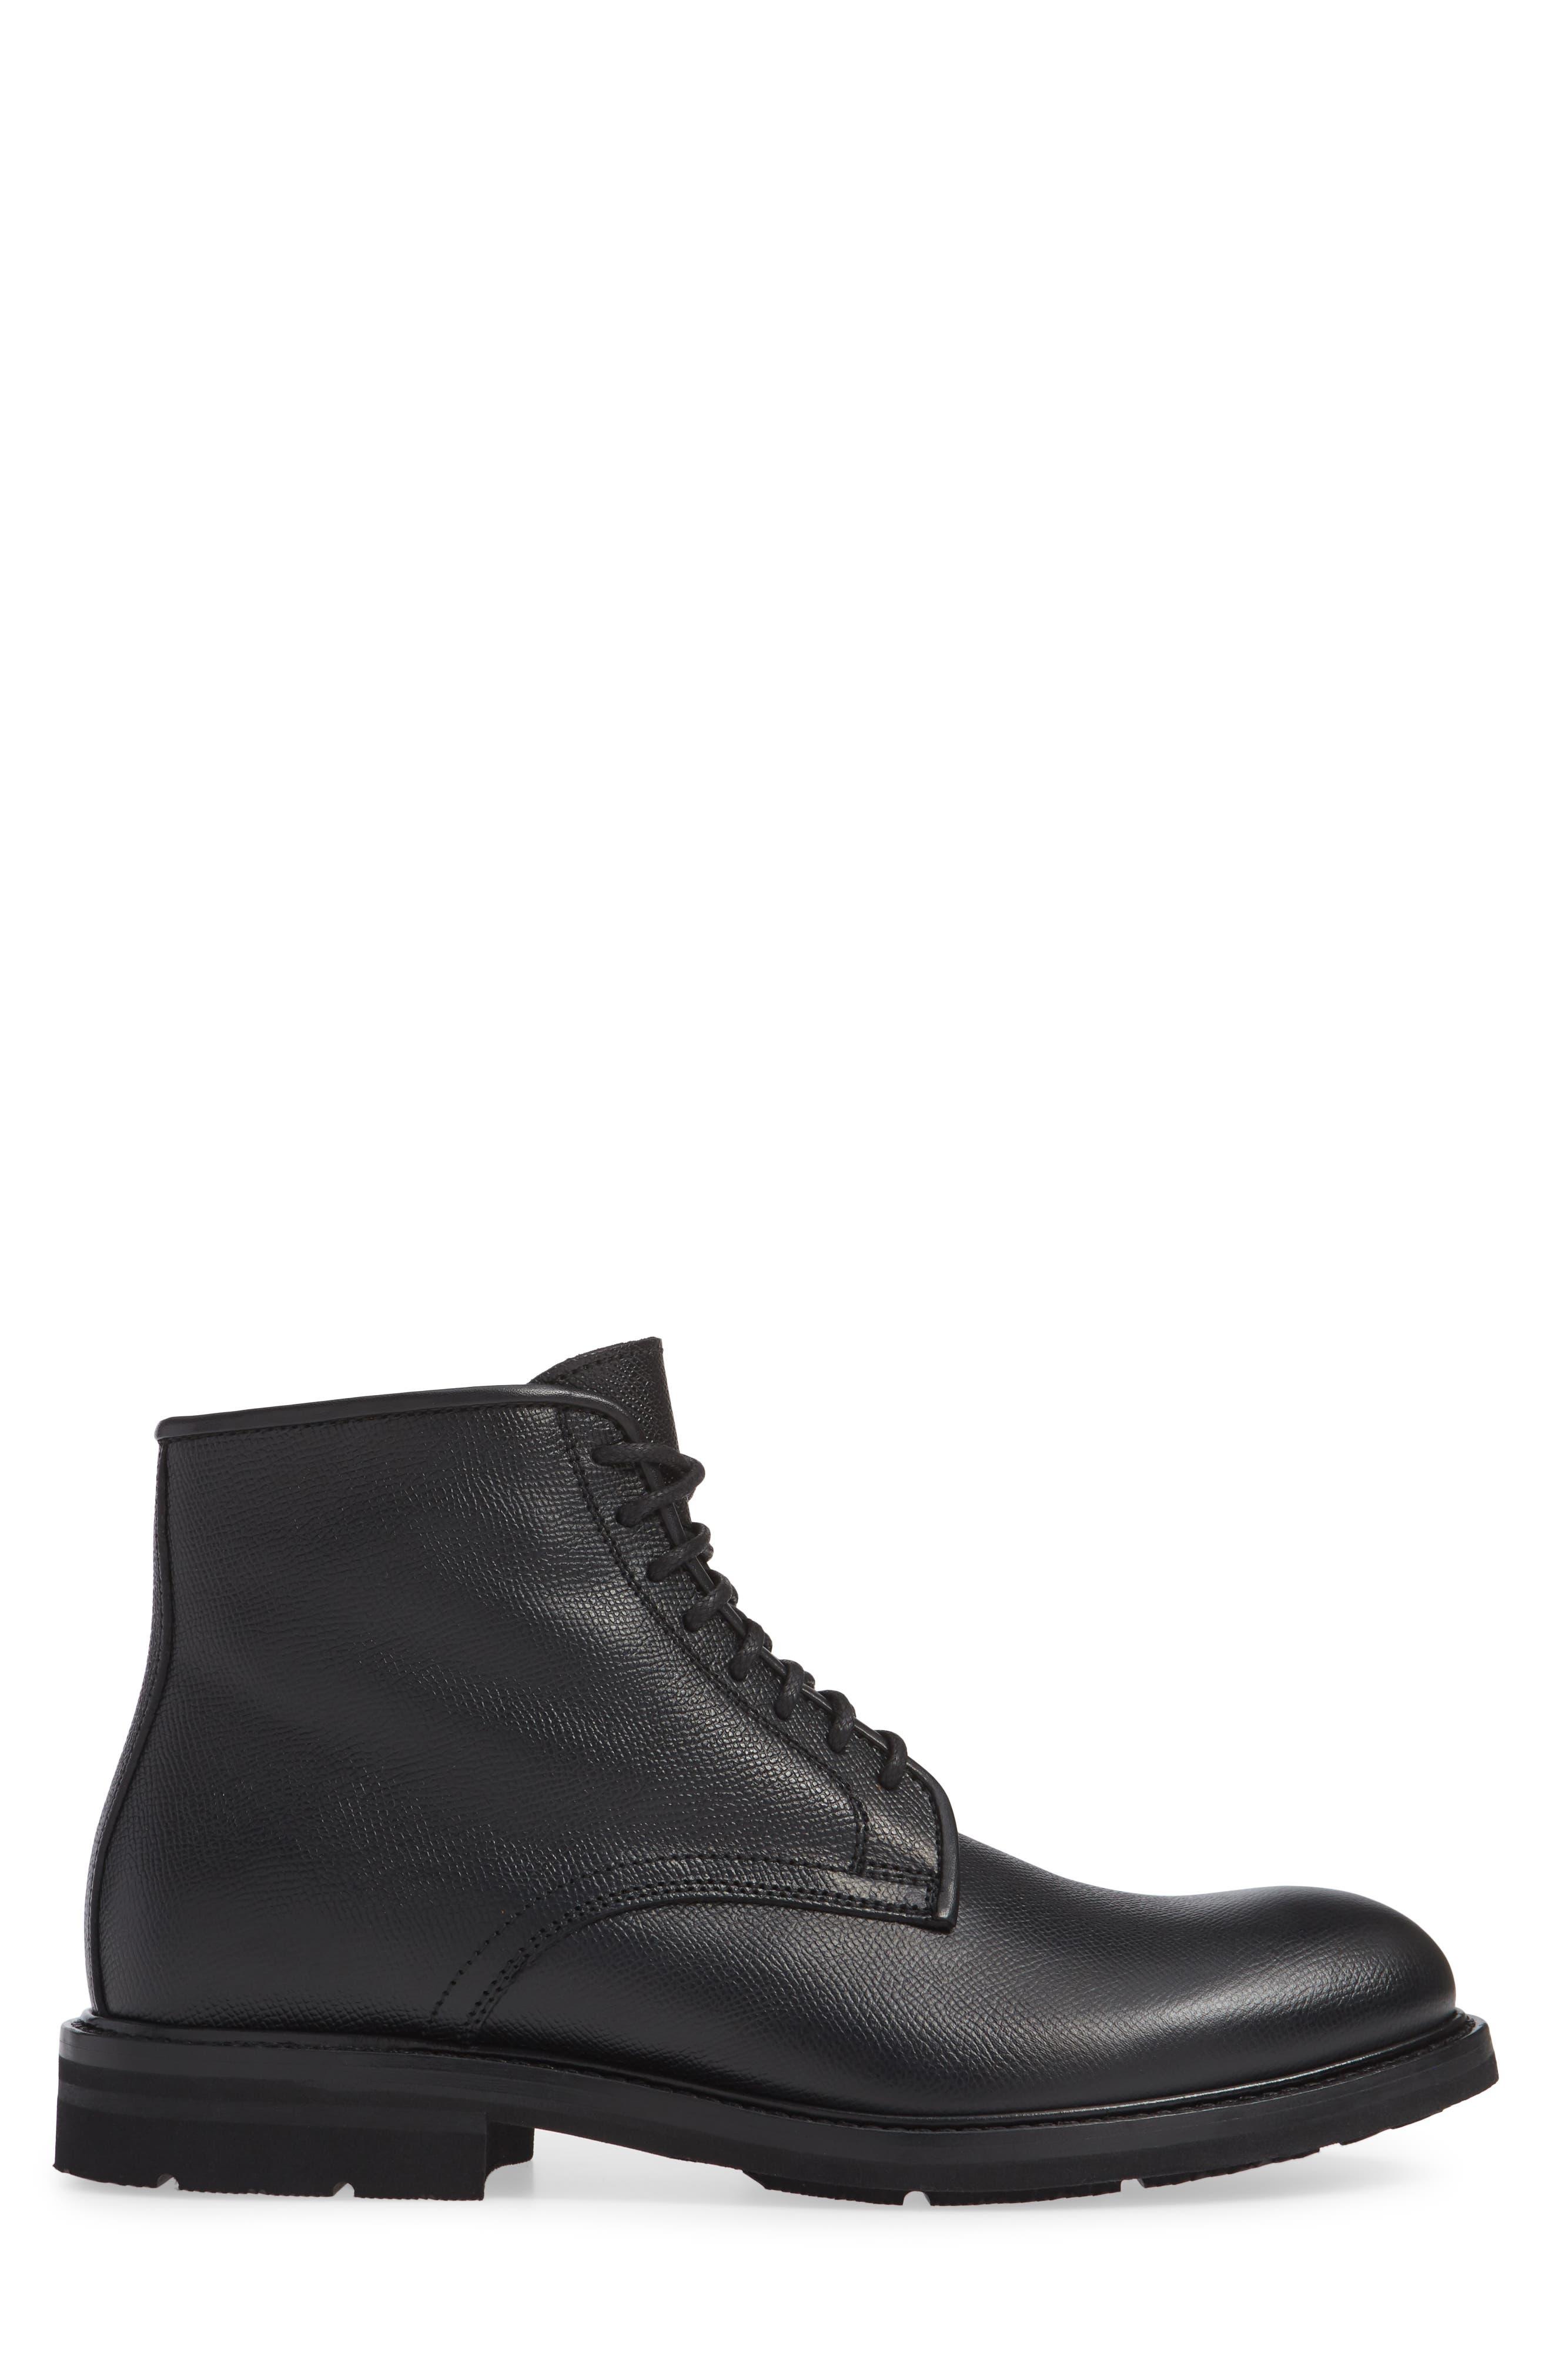 Renzo Weatherproof Plain Toe Waterproof Boot,                             Alternate thumbnail 3, color,                             BLACK